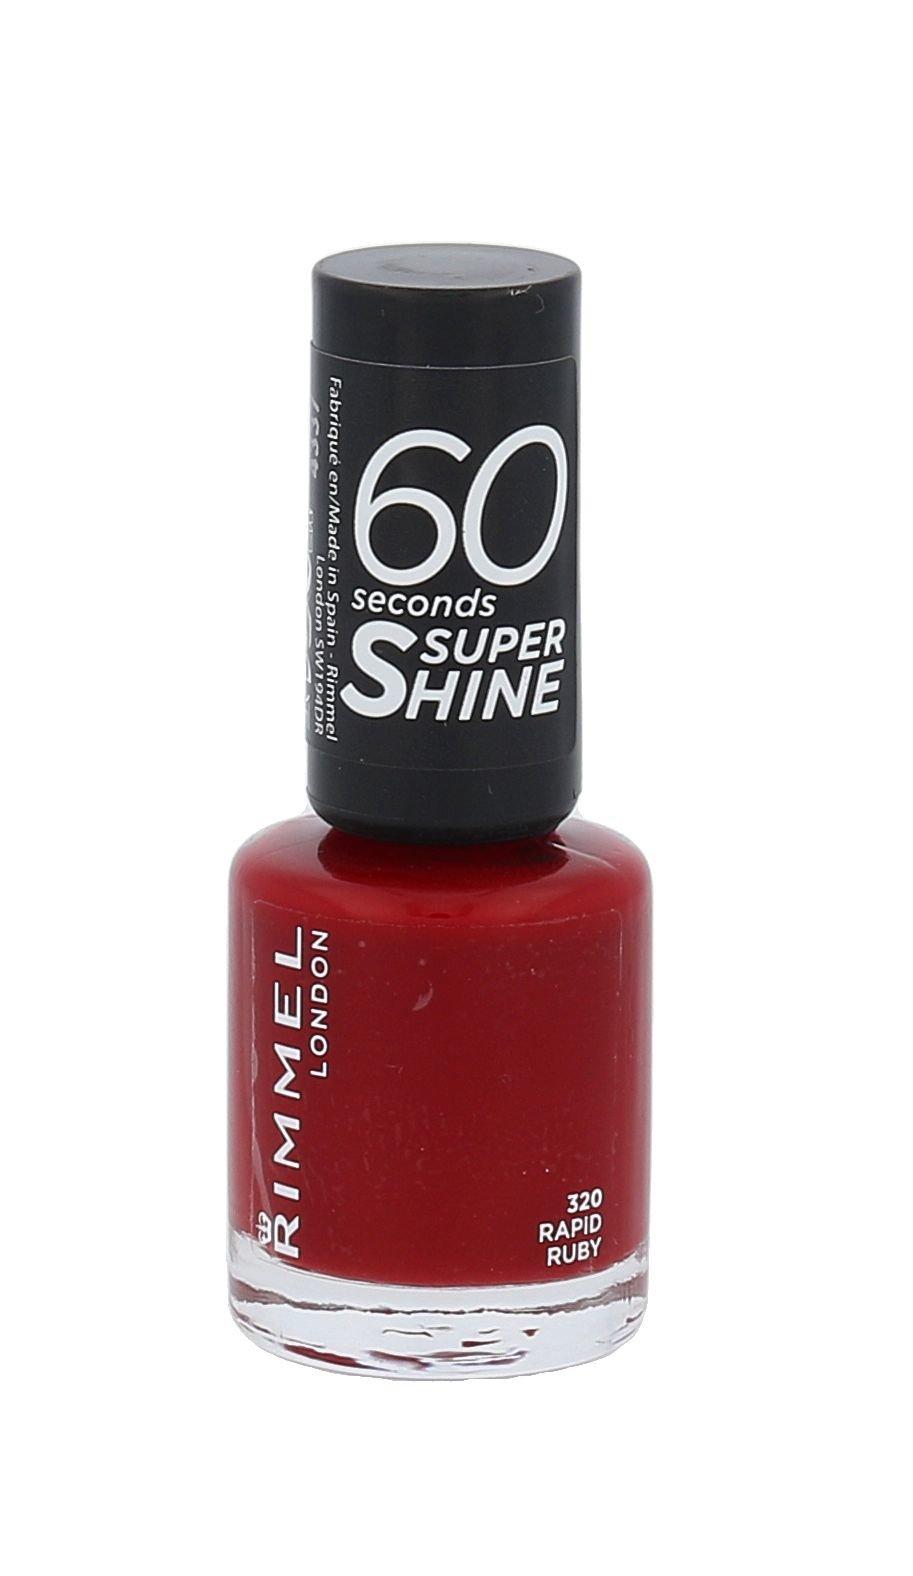 Rimmel London 60 Seconds Cosmetic 8ml 320 Rapid Ruby